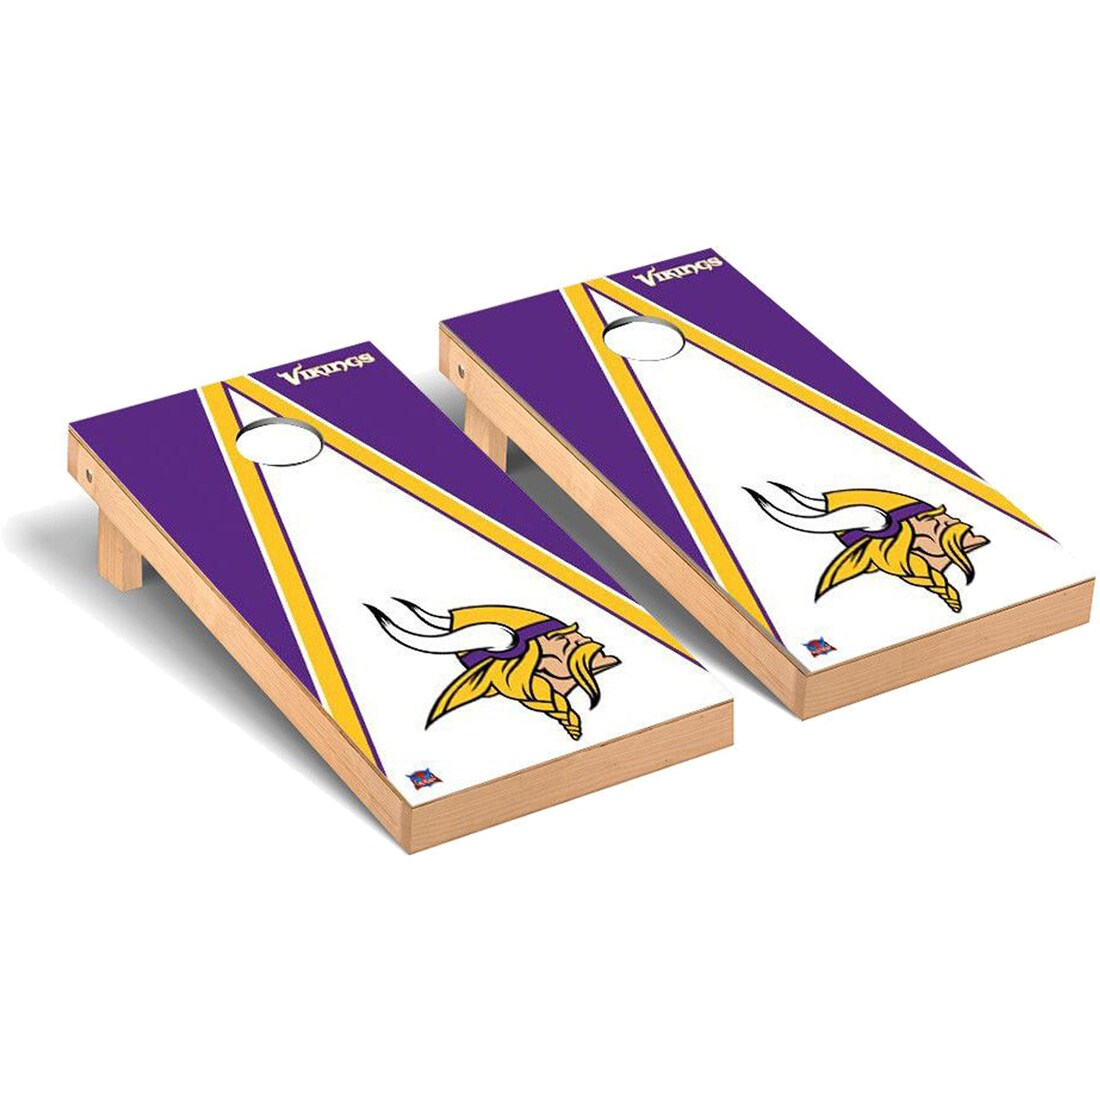 Minnesota Vikings 2' x 4' Triangle Cornhole Board Tailgate Toss Set